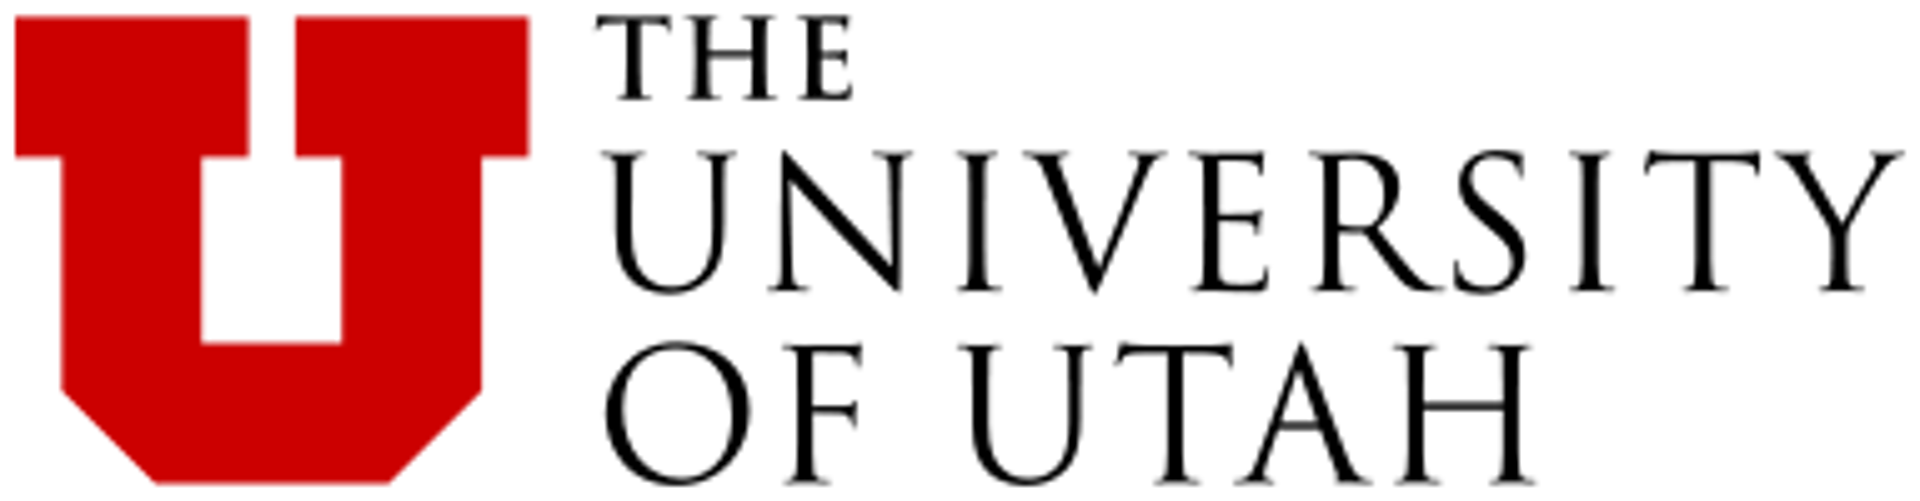 Logo 1368651714.png?ixlib=rb 1.1